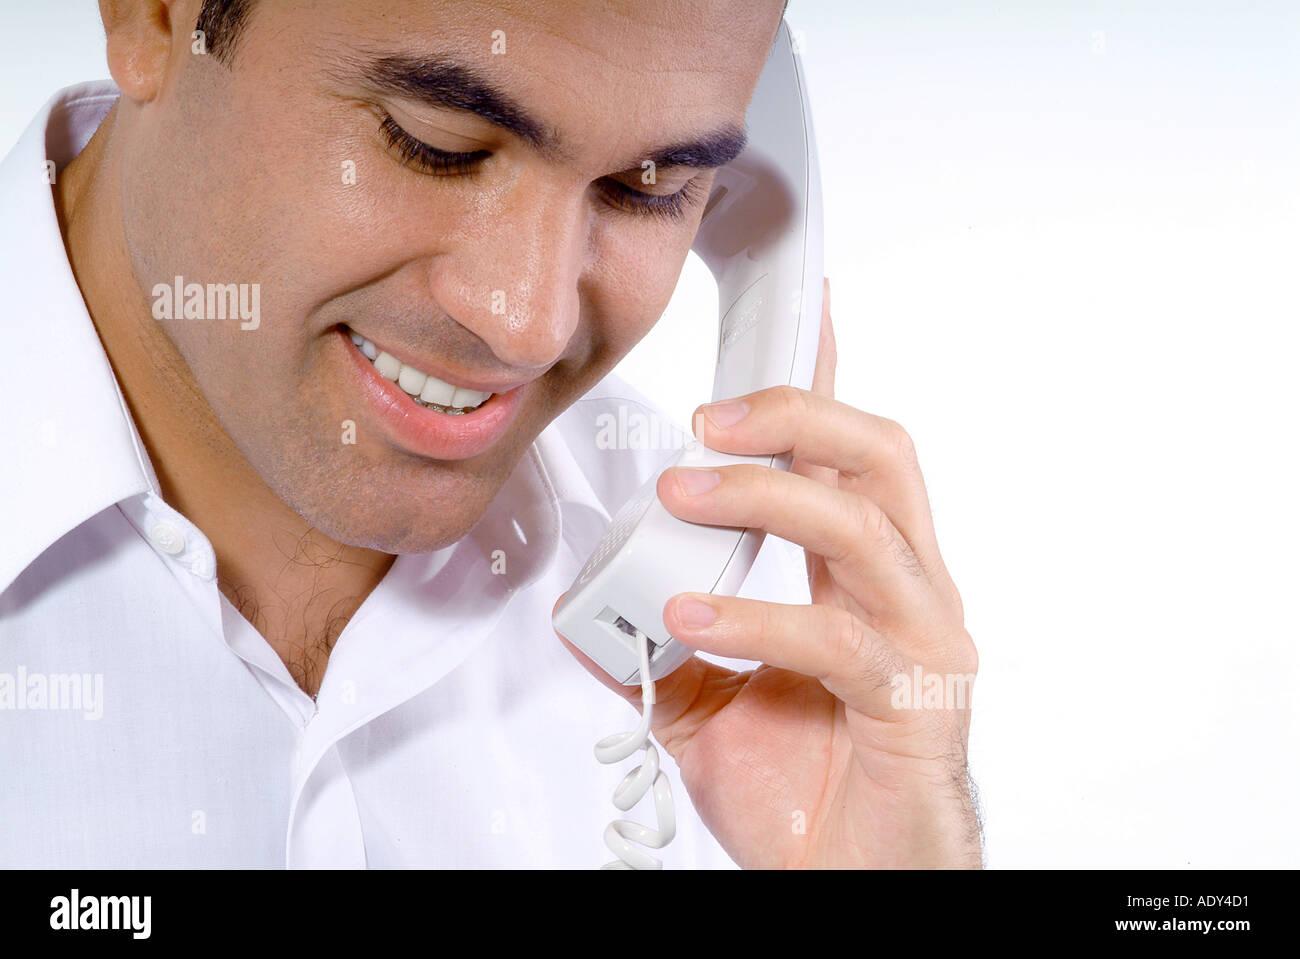 Communication phone phones telephones telephone phone phones cellular cellulars smiling talking laughing communication - Stock Image